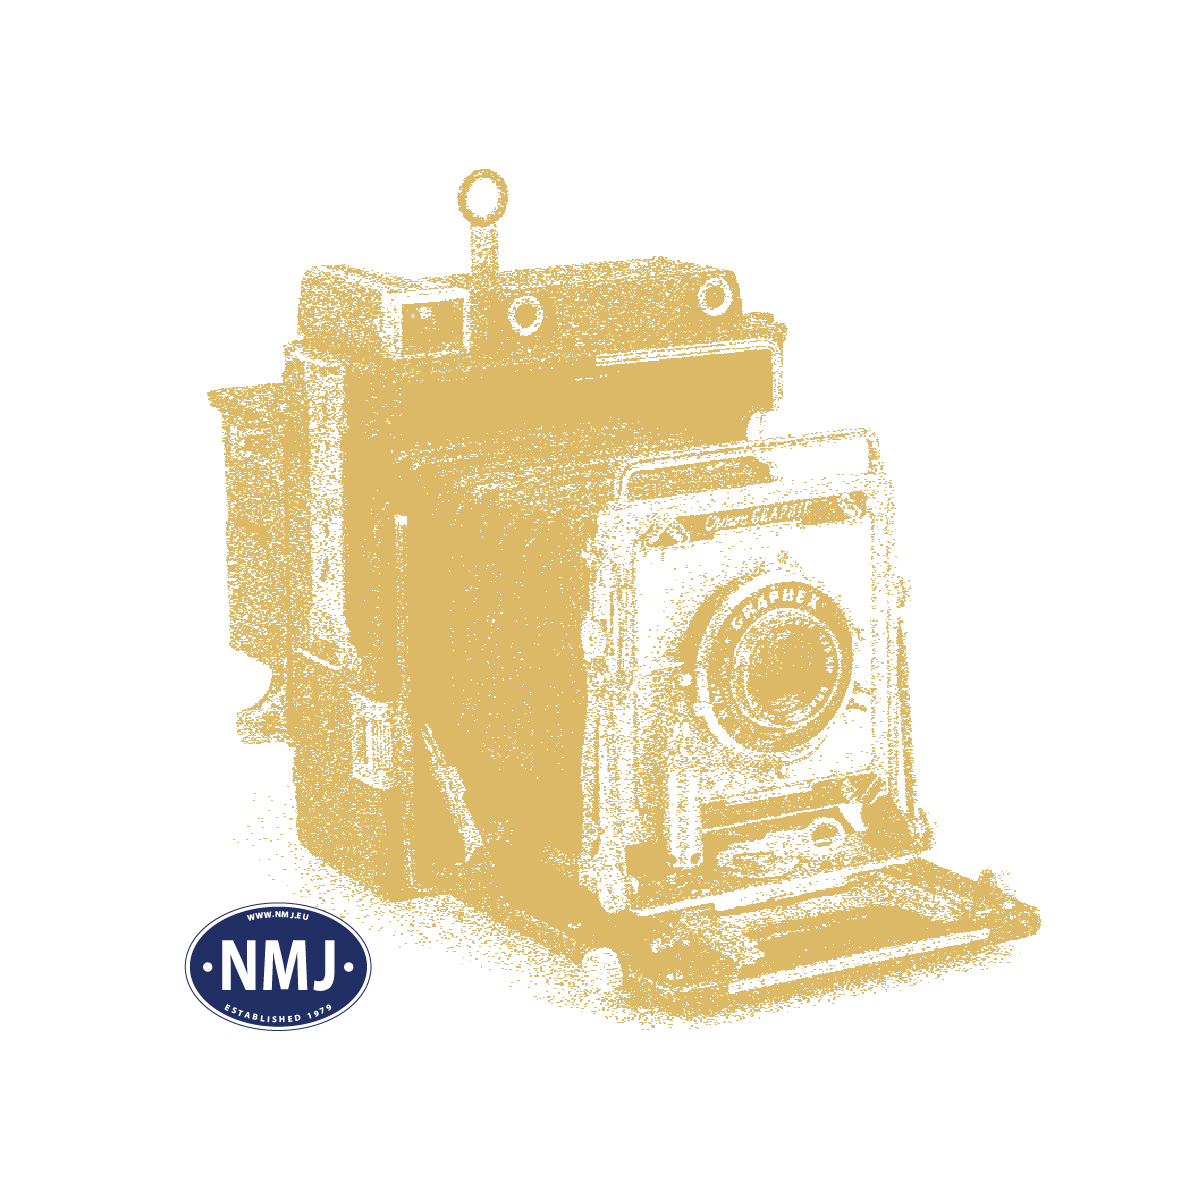 "NMJT506.305 - NMJ Topline NSB Gbs 150 0 230-0 ""Adresseavisen"""